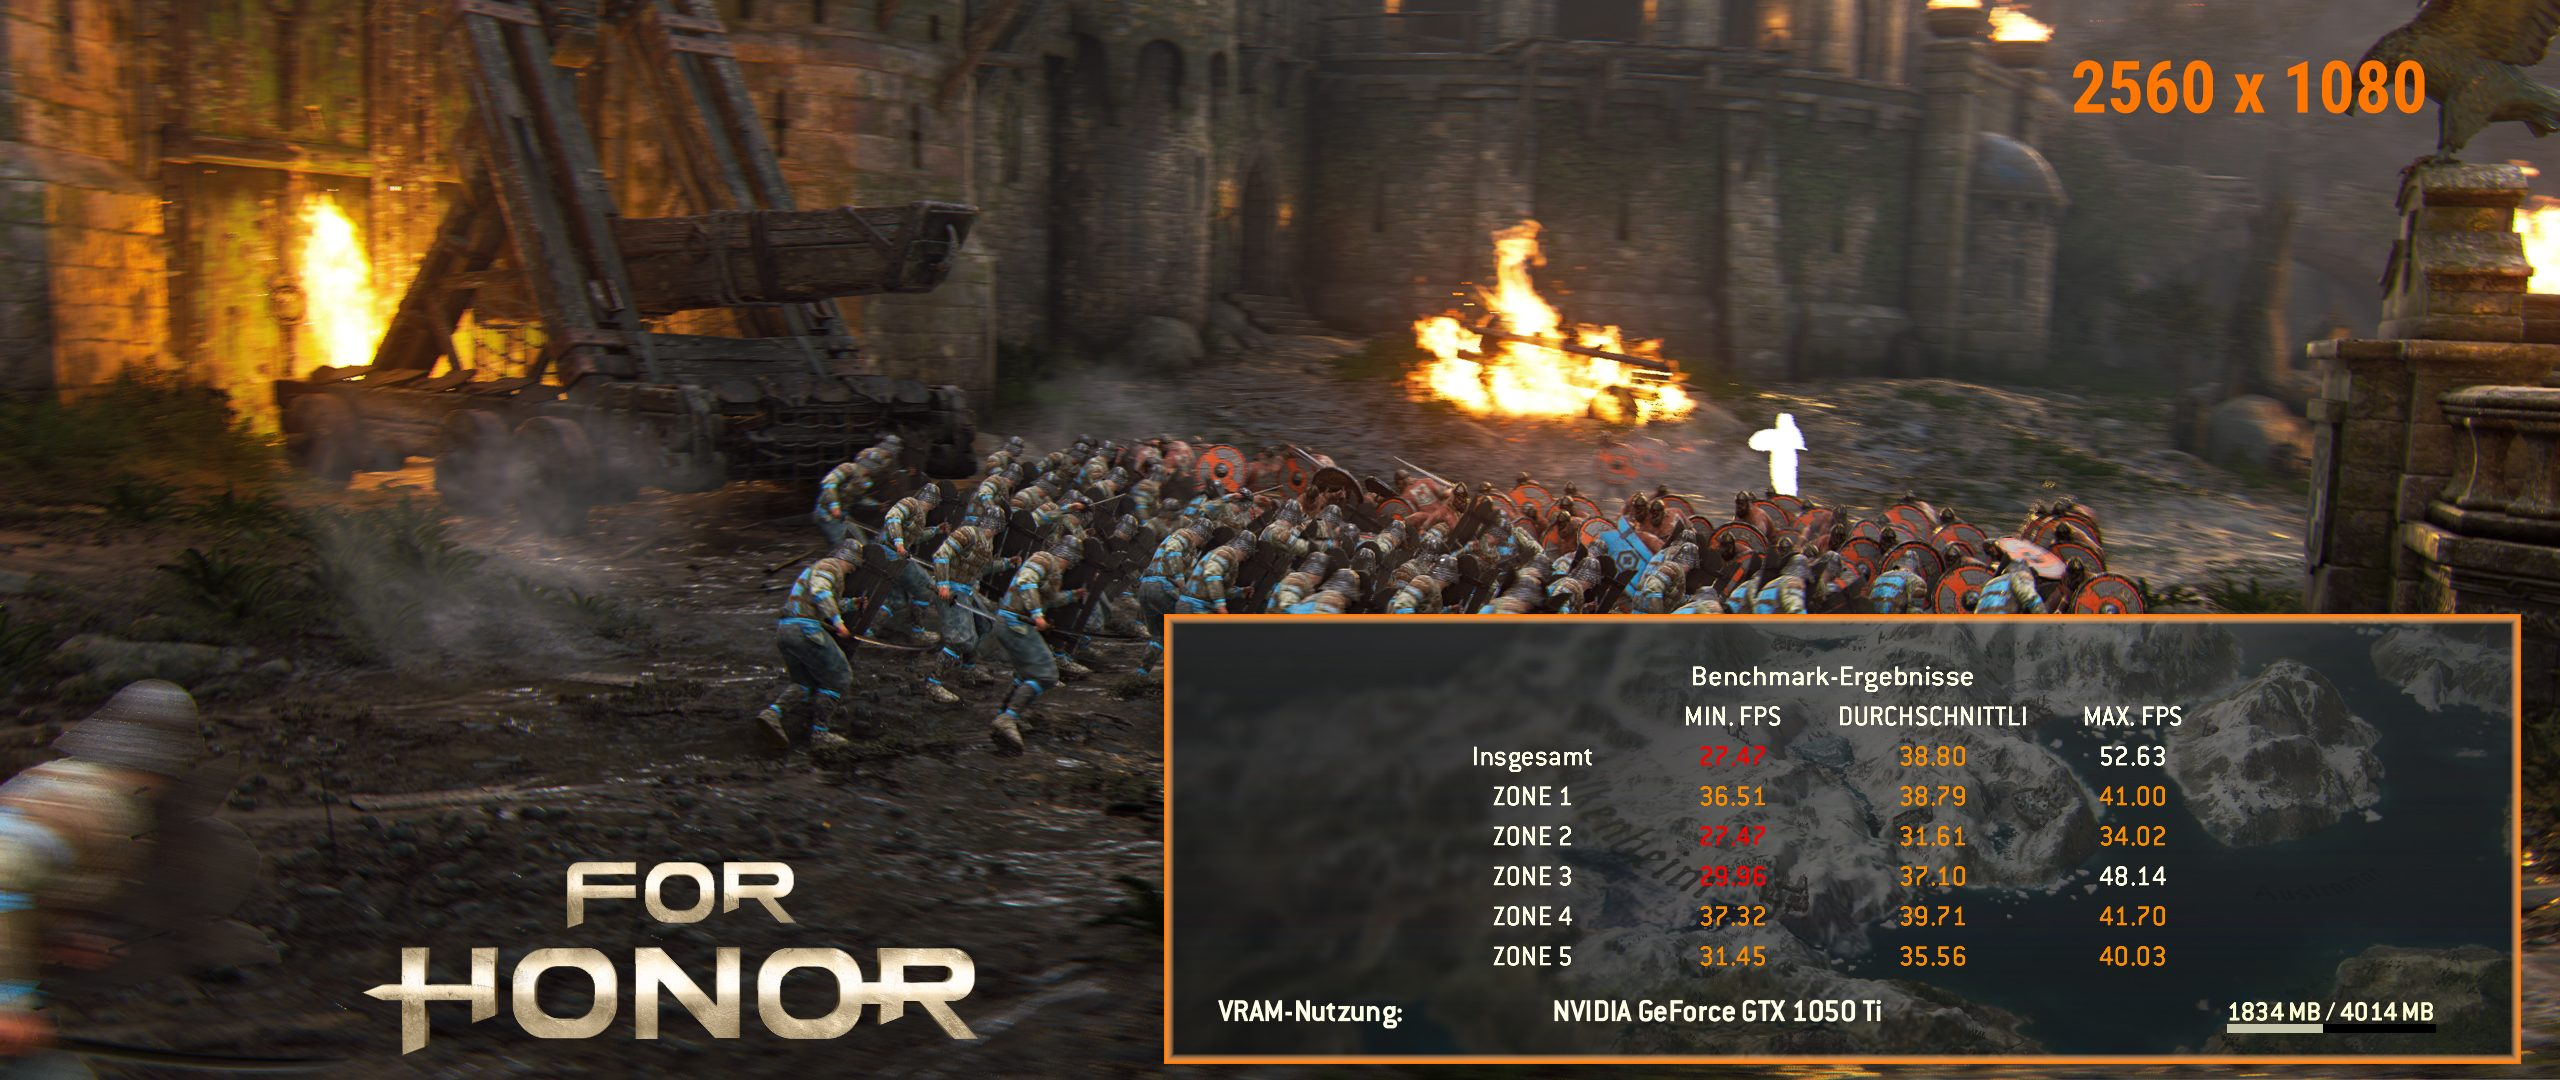 Schenker-XMGA507-NBB-qjz_Games-Monitor_5